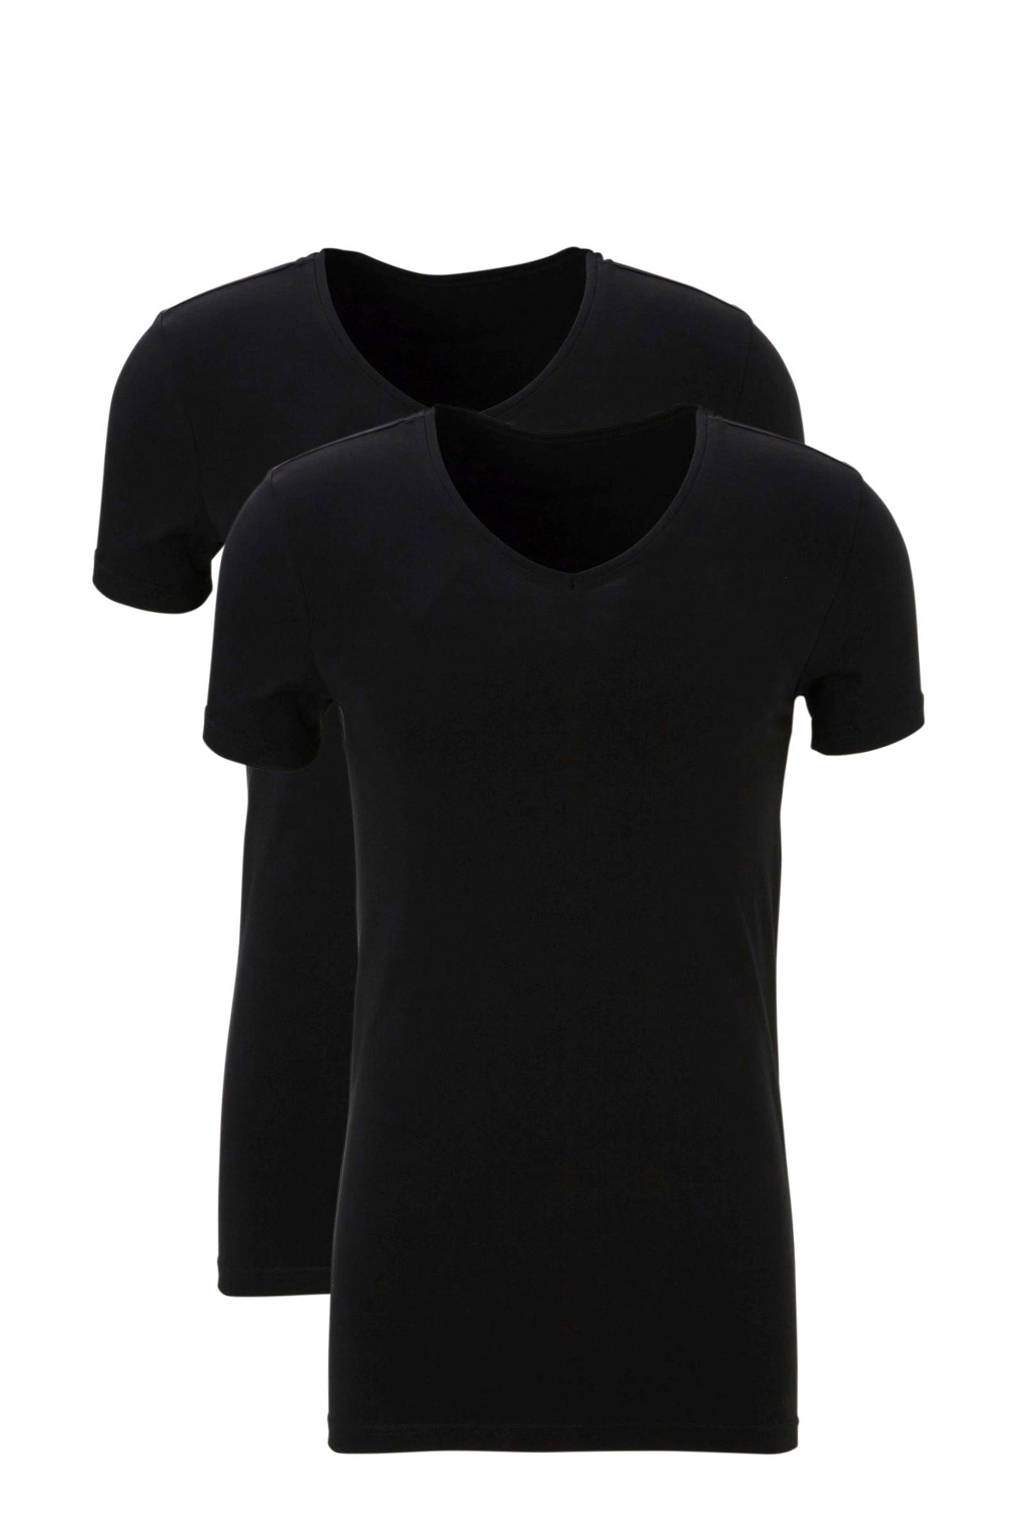 ten Cate extra lang slimfit T-shirt (set van 2) zwart, Zwart